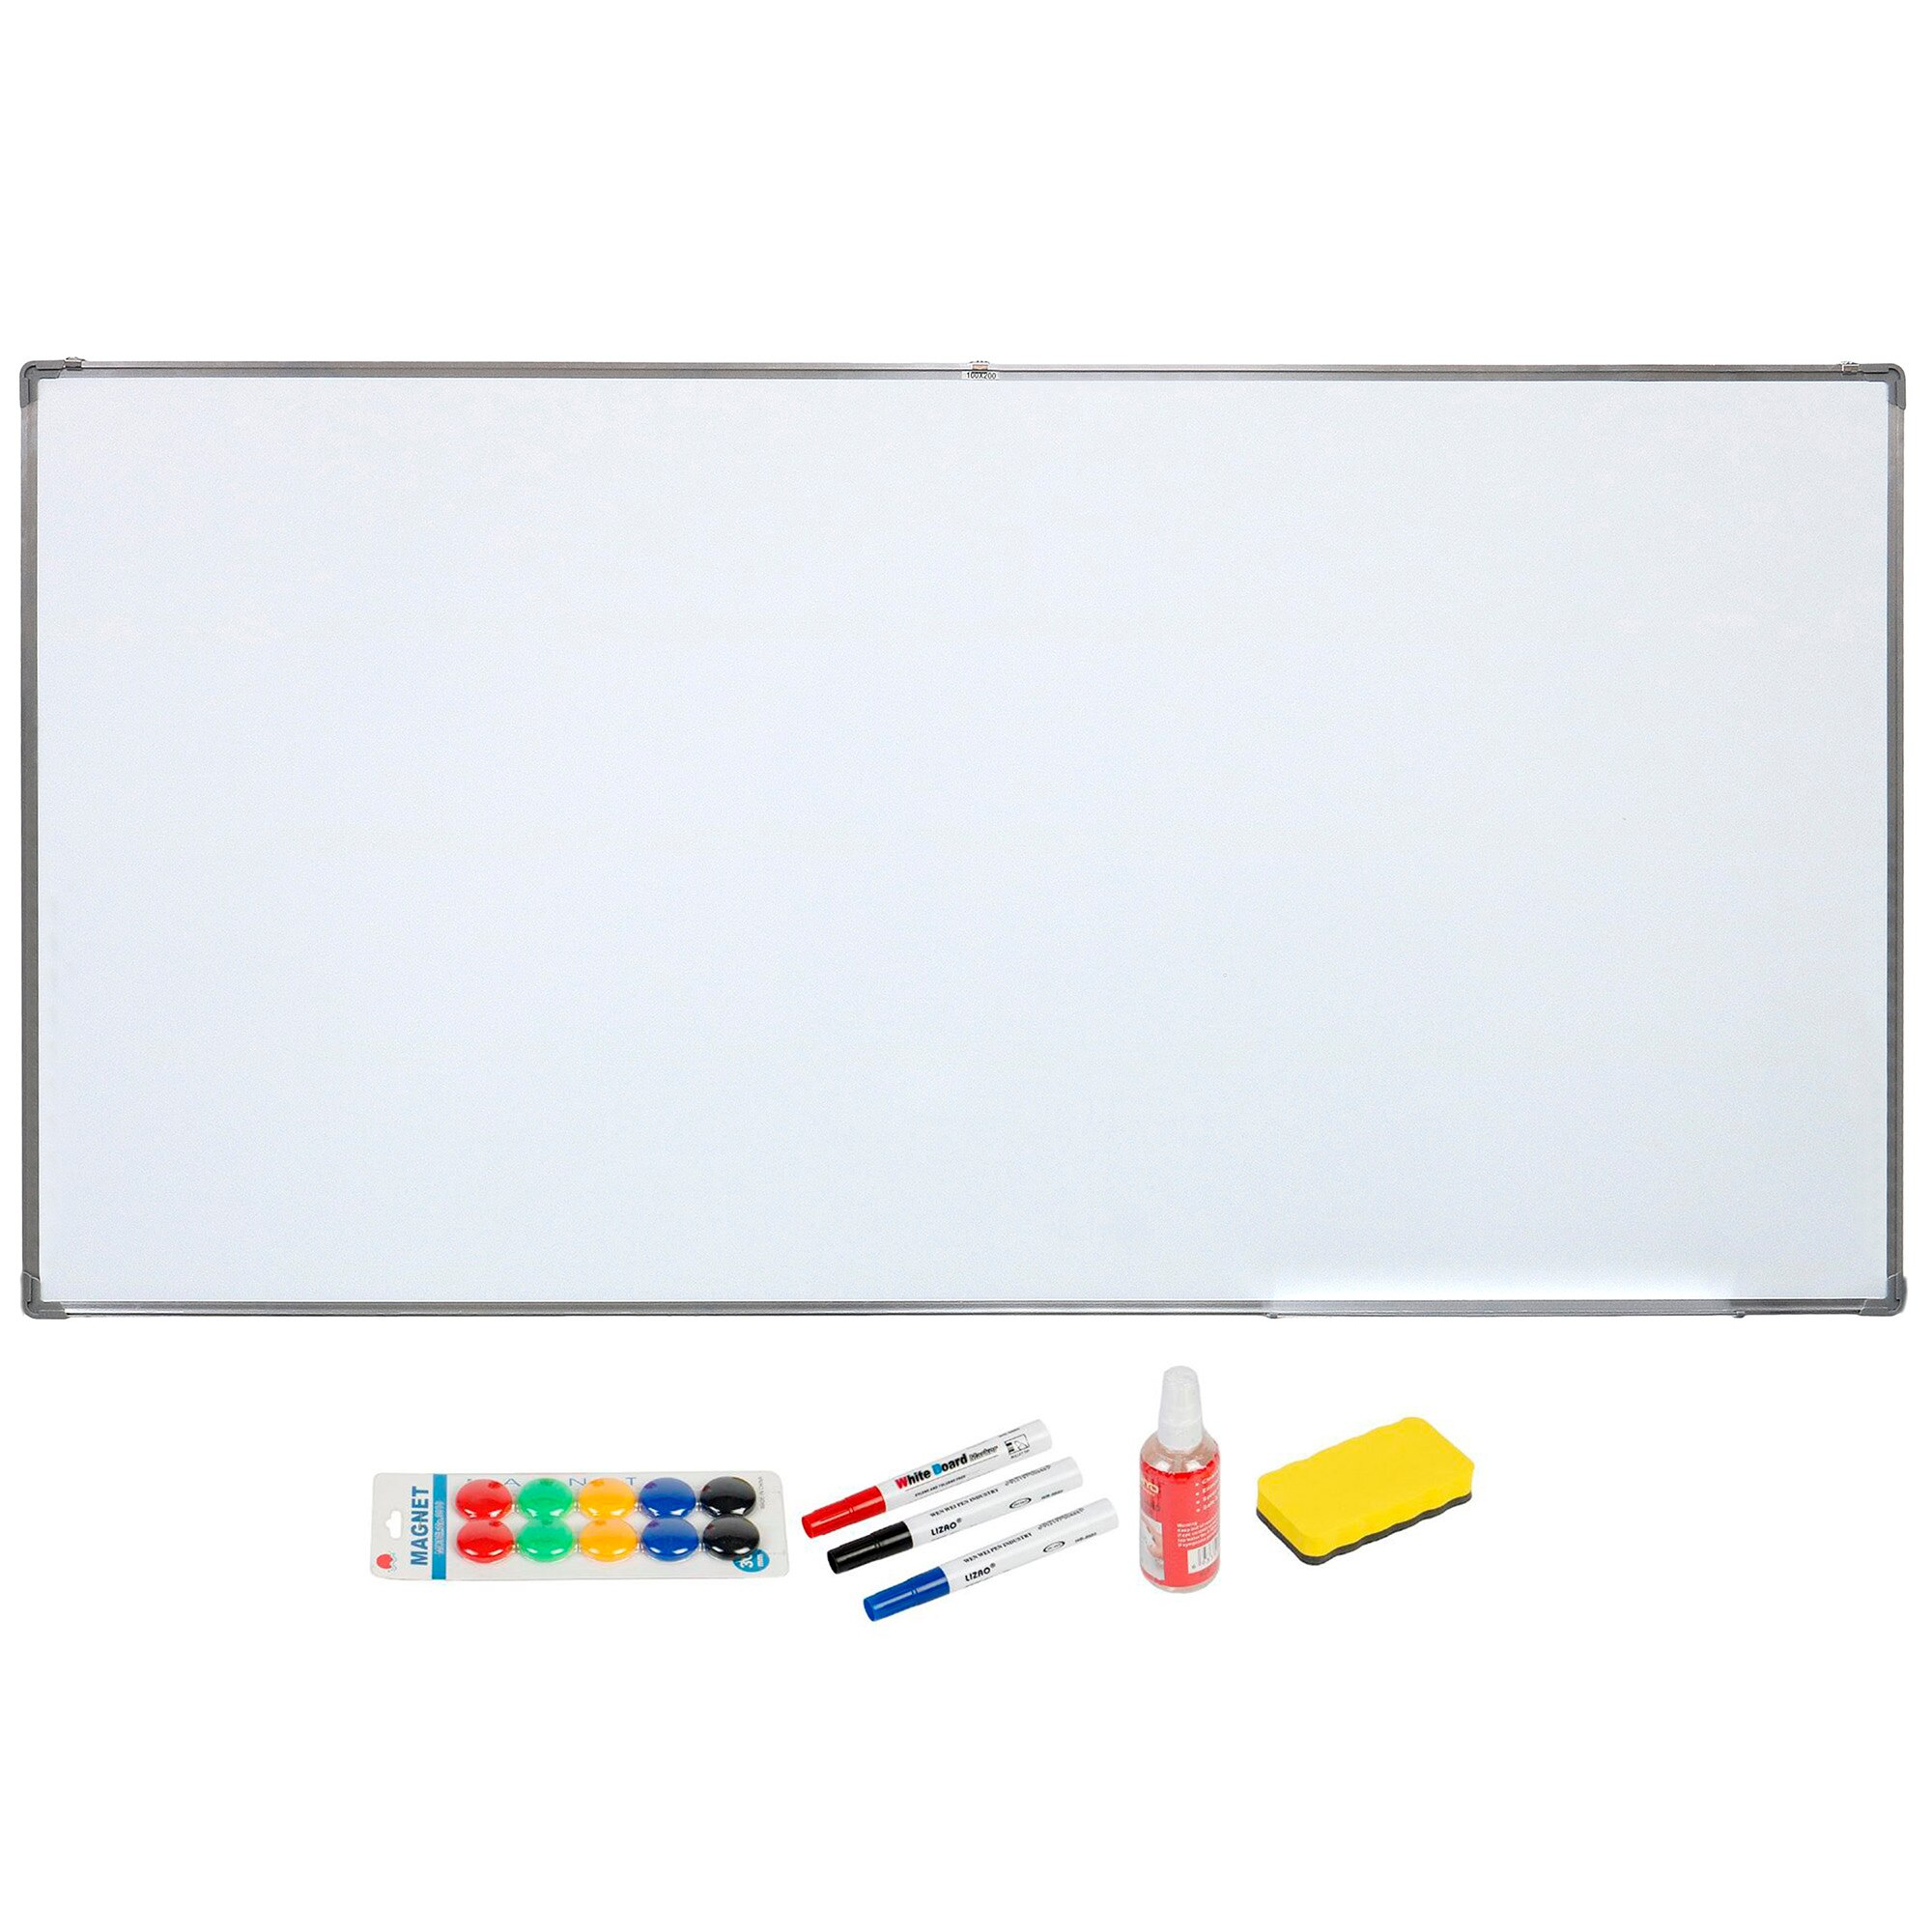 Fotografie Tabla magnetica A+, 1000 x 2000 mm + accesorii -1 set markere, burete, spray, magneti